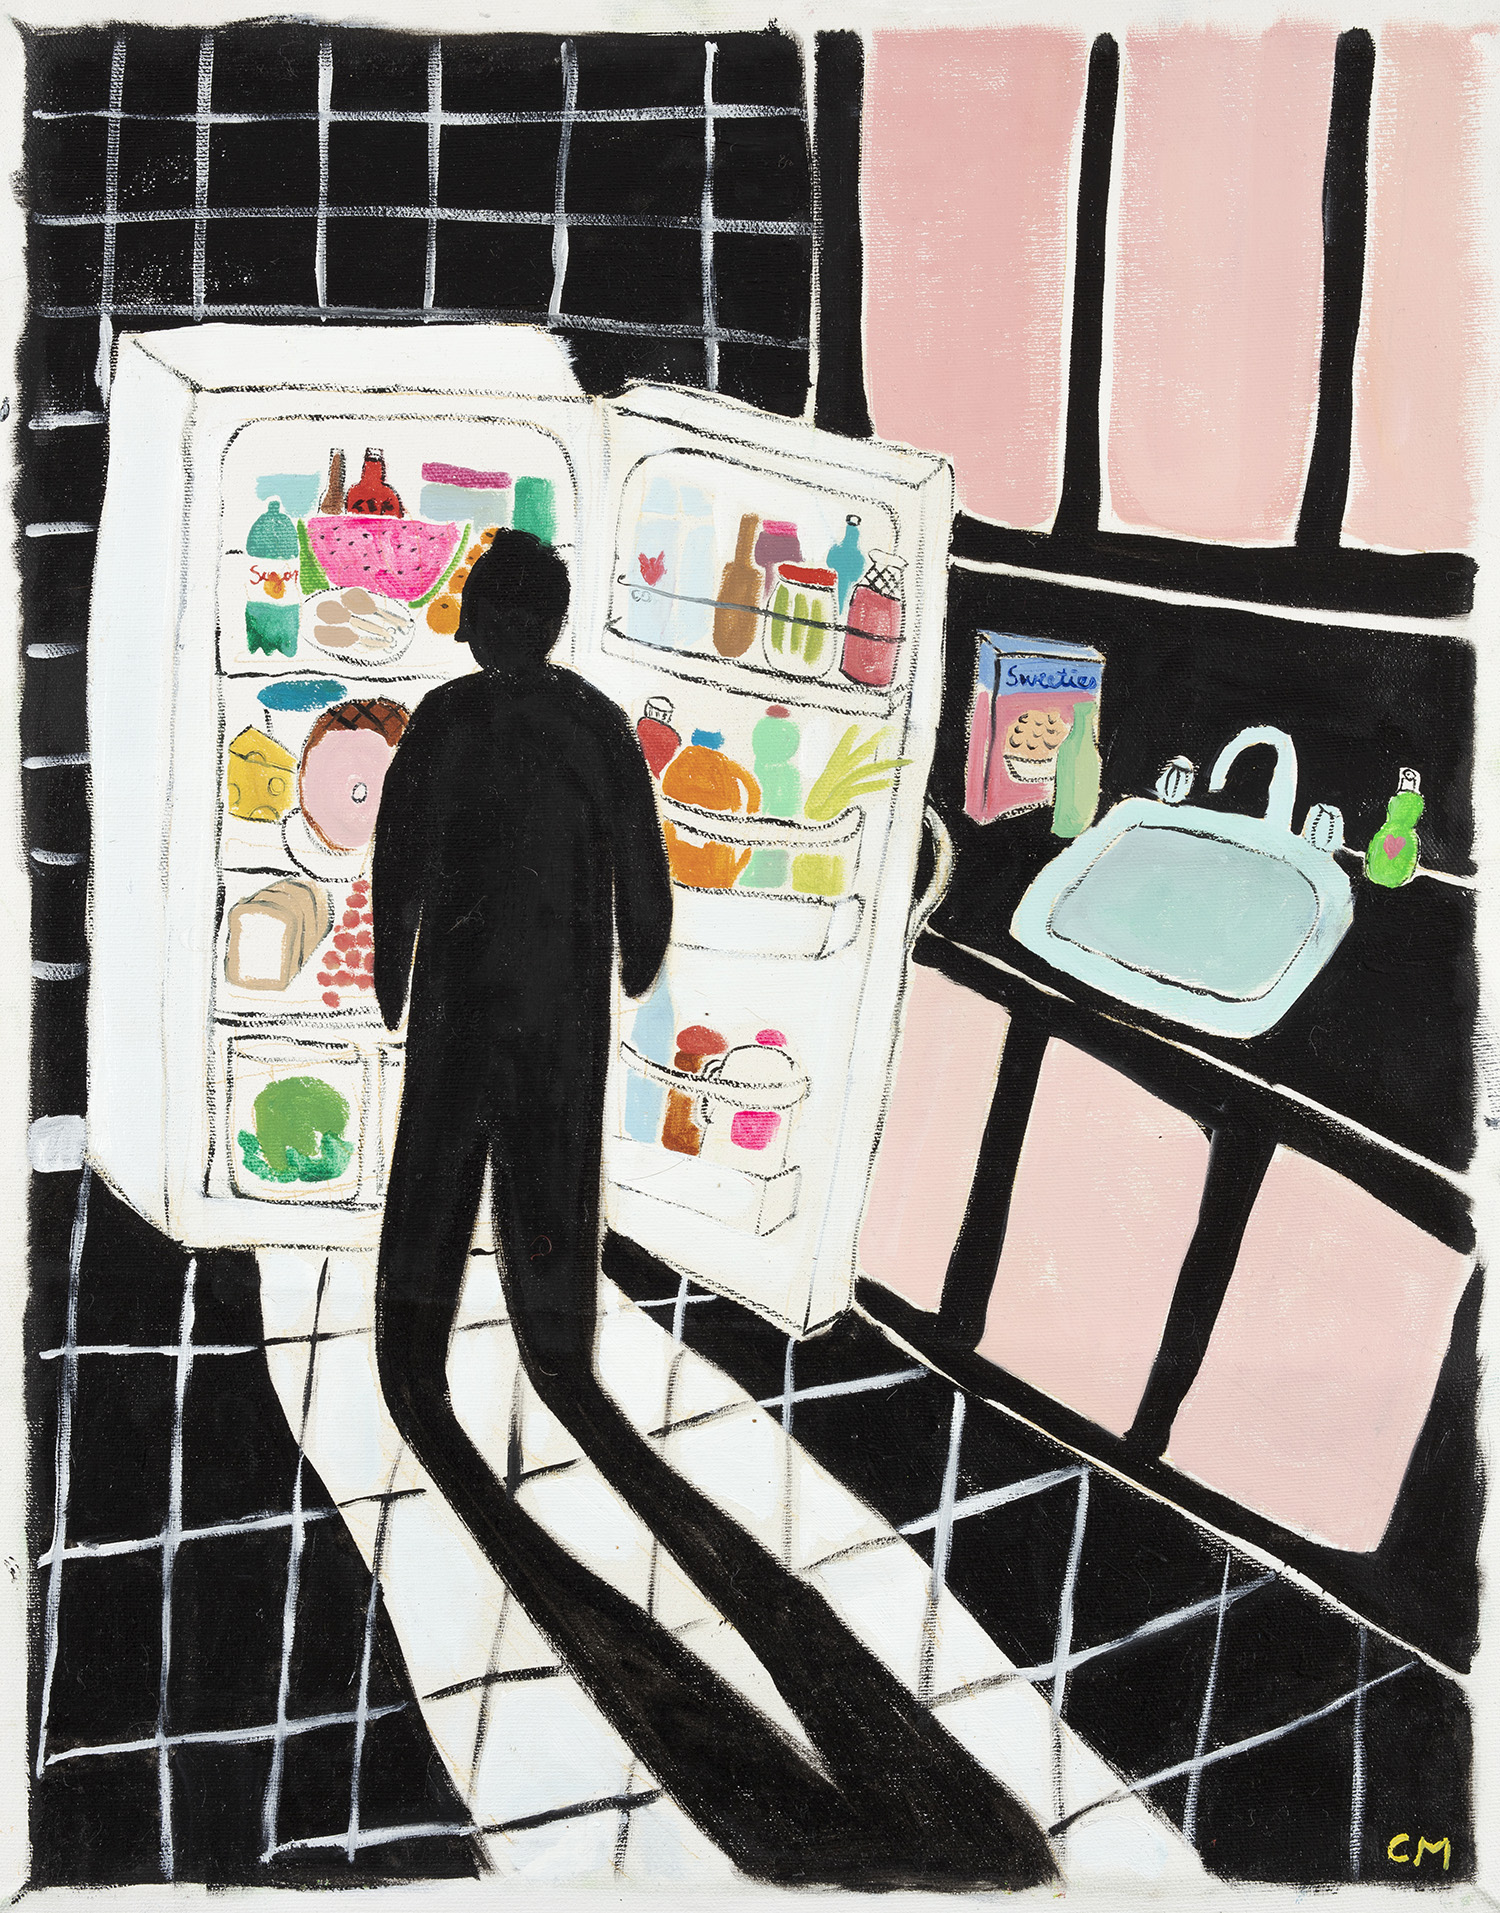 Claire Milbrath. Black Kitchen, 2018. Oil on canvas. 18 x 14 inches (45.7 x 35.6 cm)